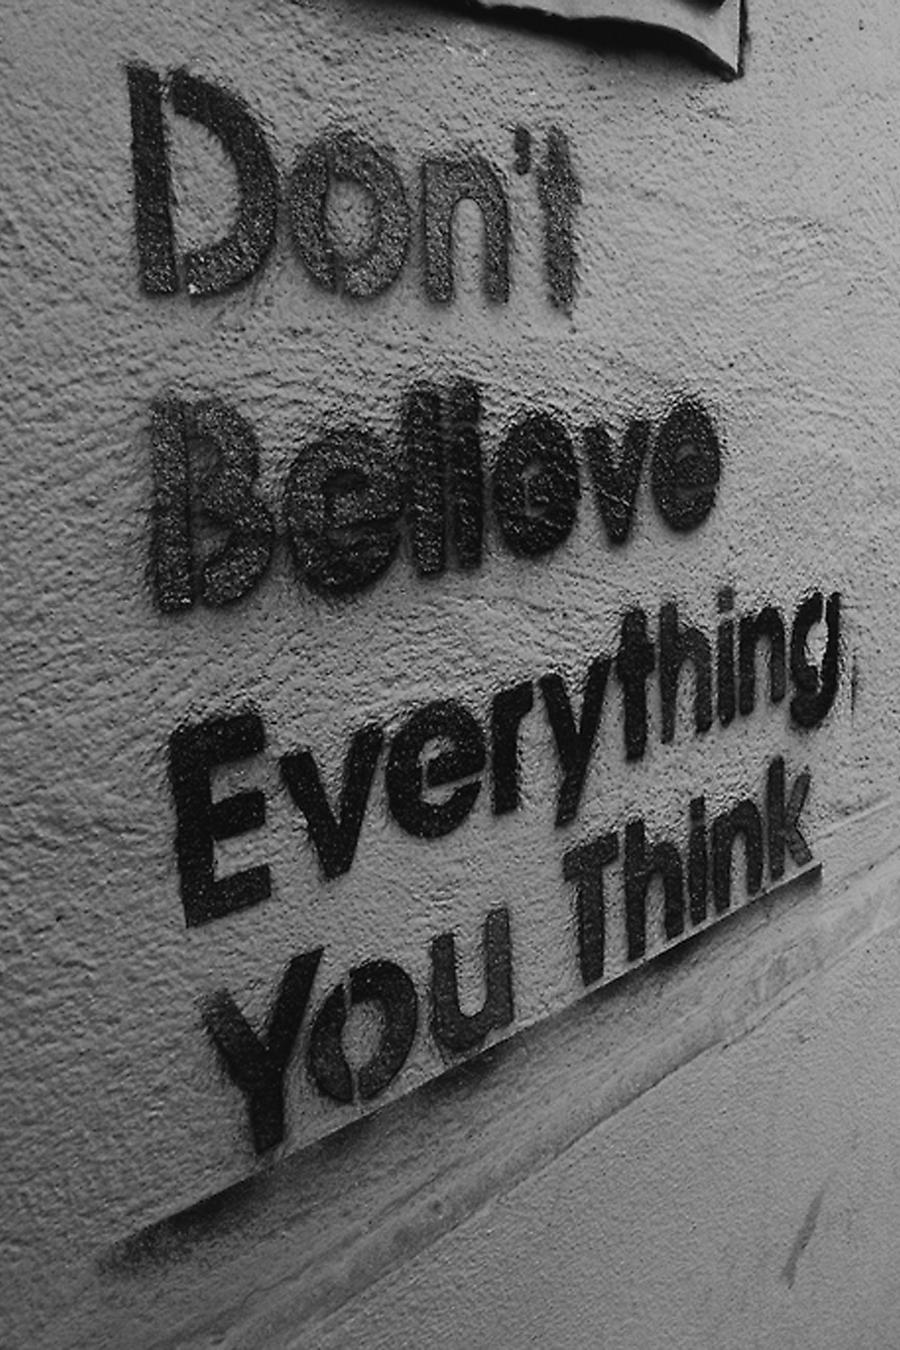 Pin by hanna on words pinterest positivity street art and street